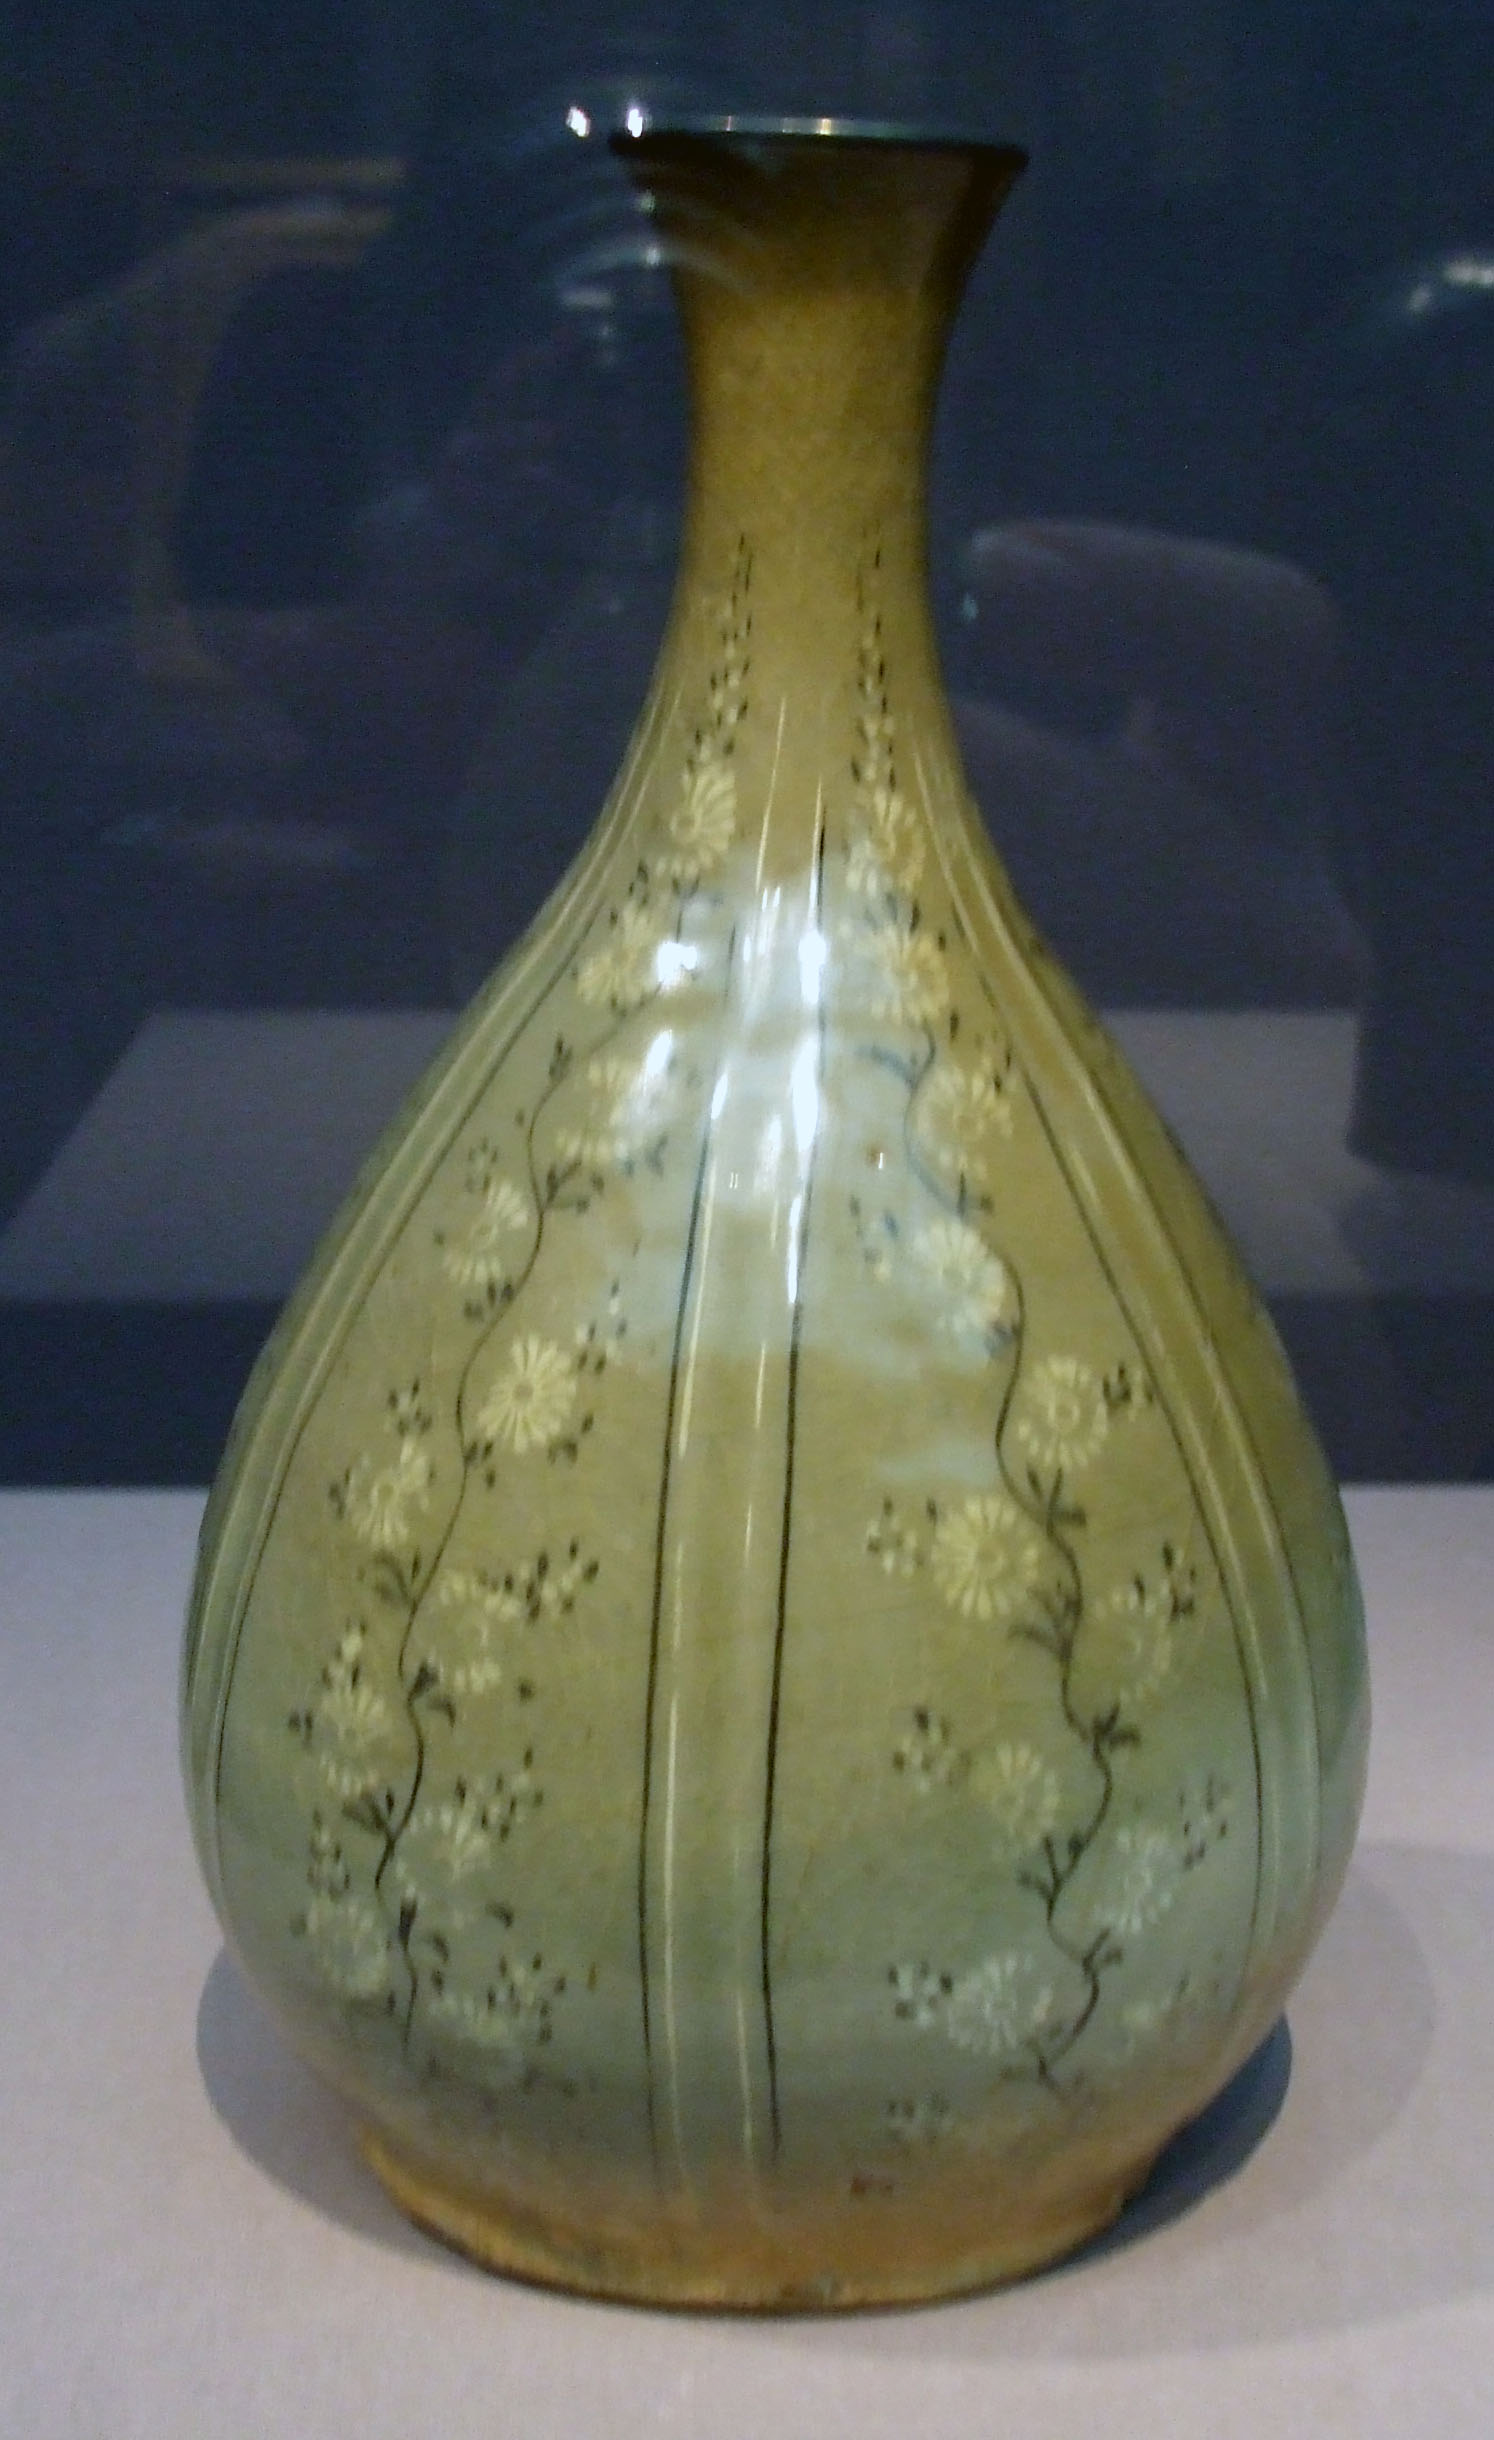 Korean Koryo dynasty 918-1392